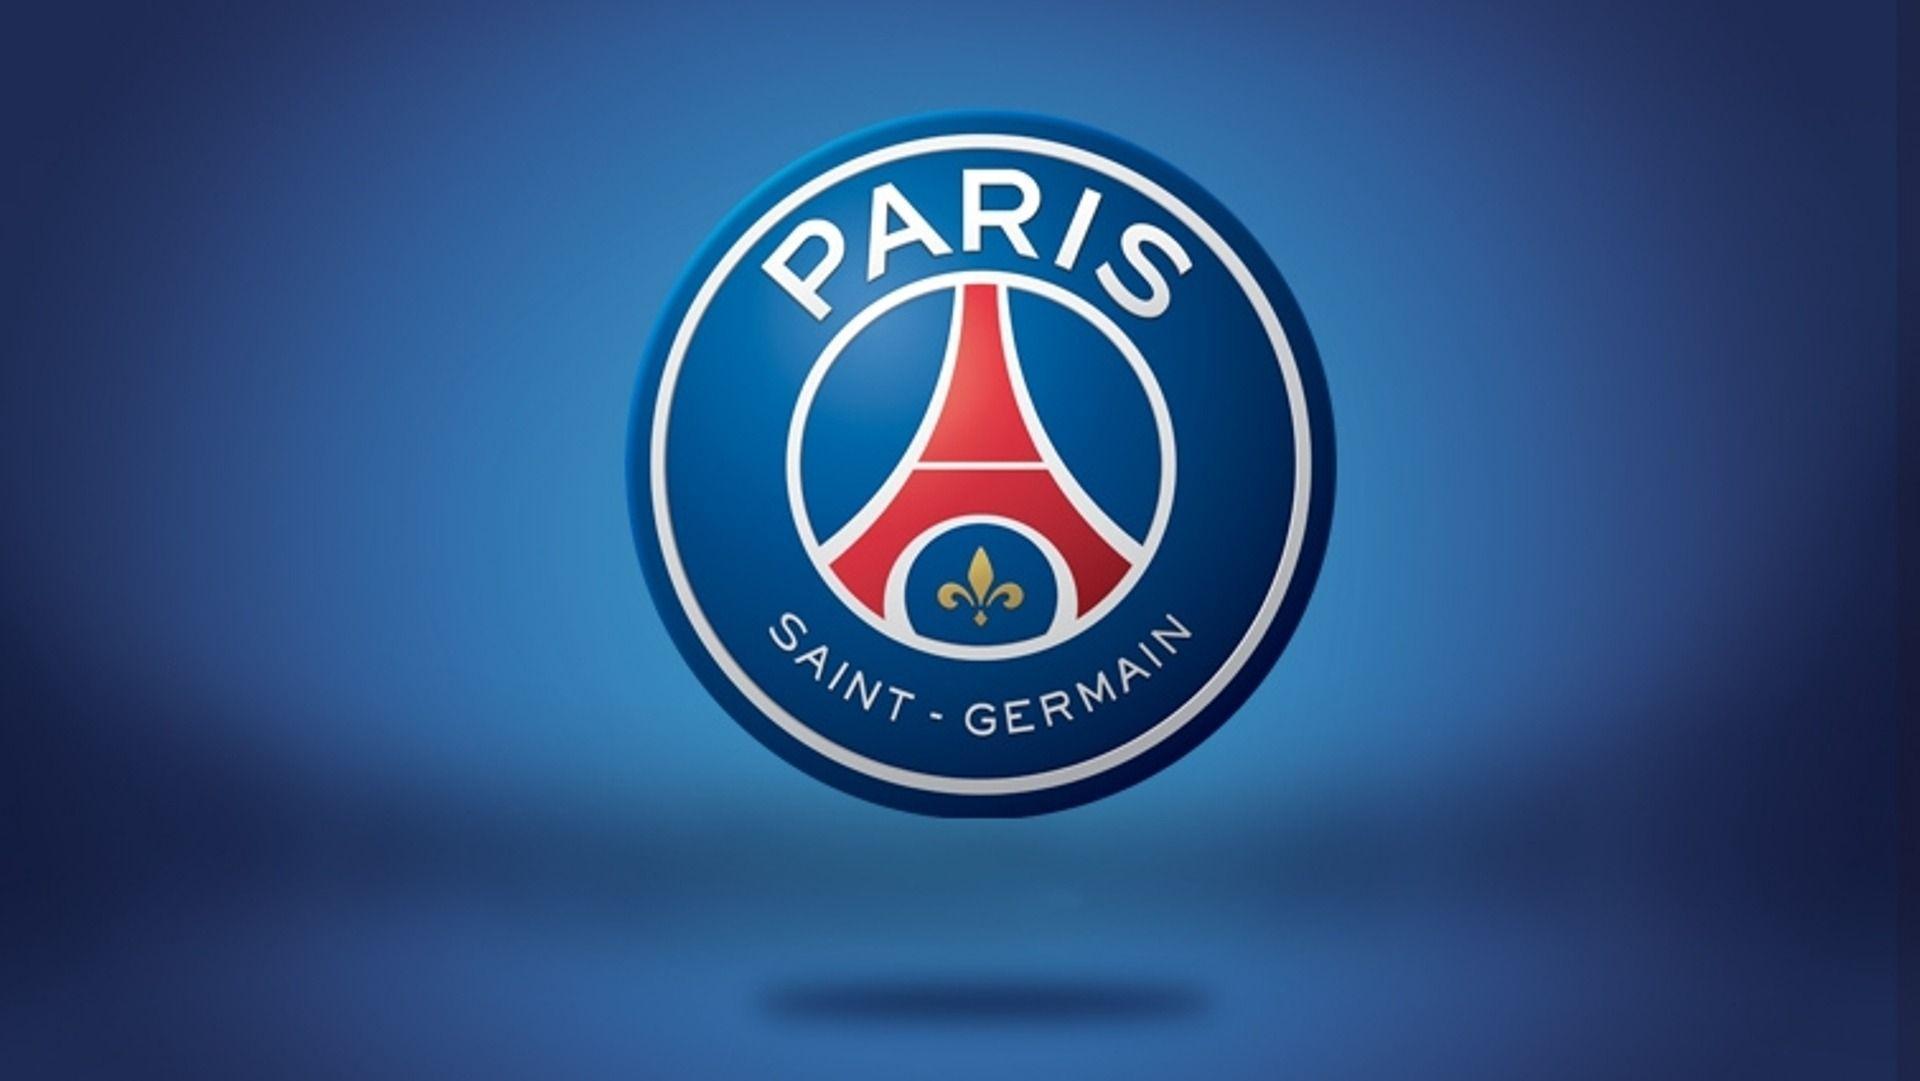 Paris Saint-Germain F.C. Background 8